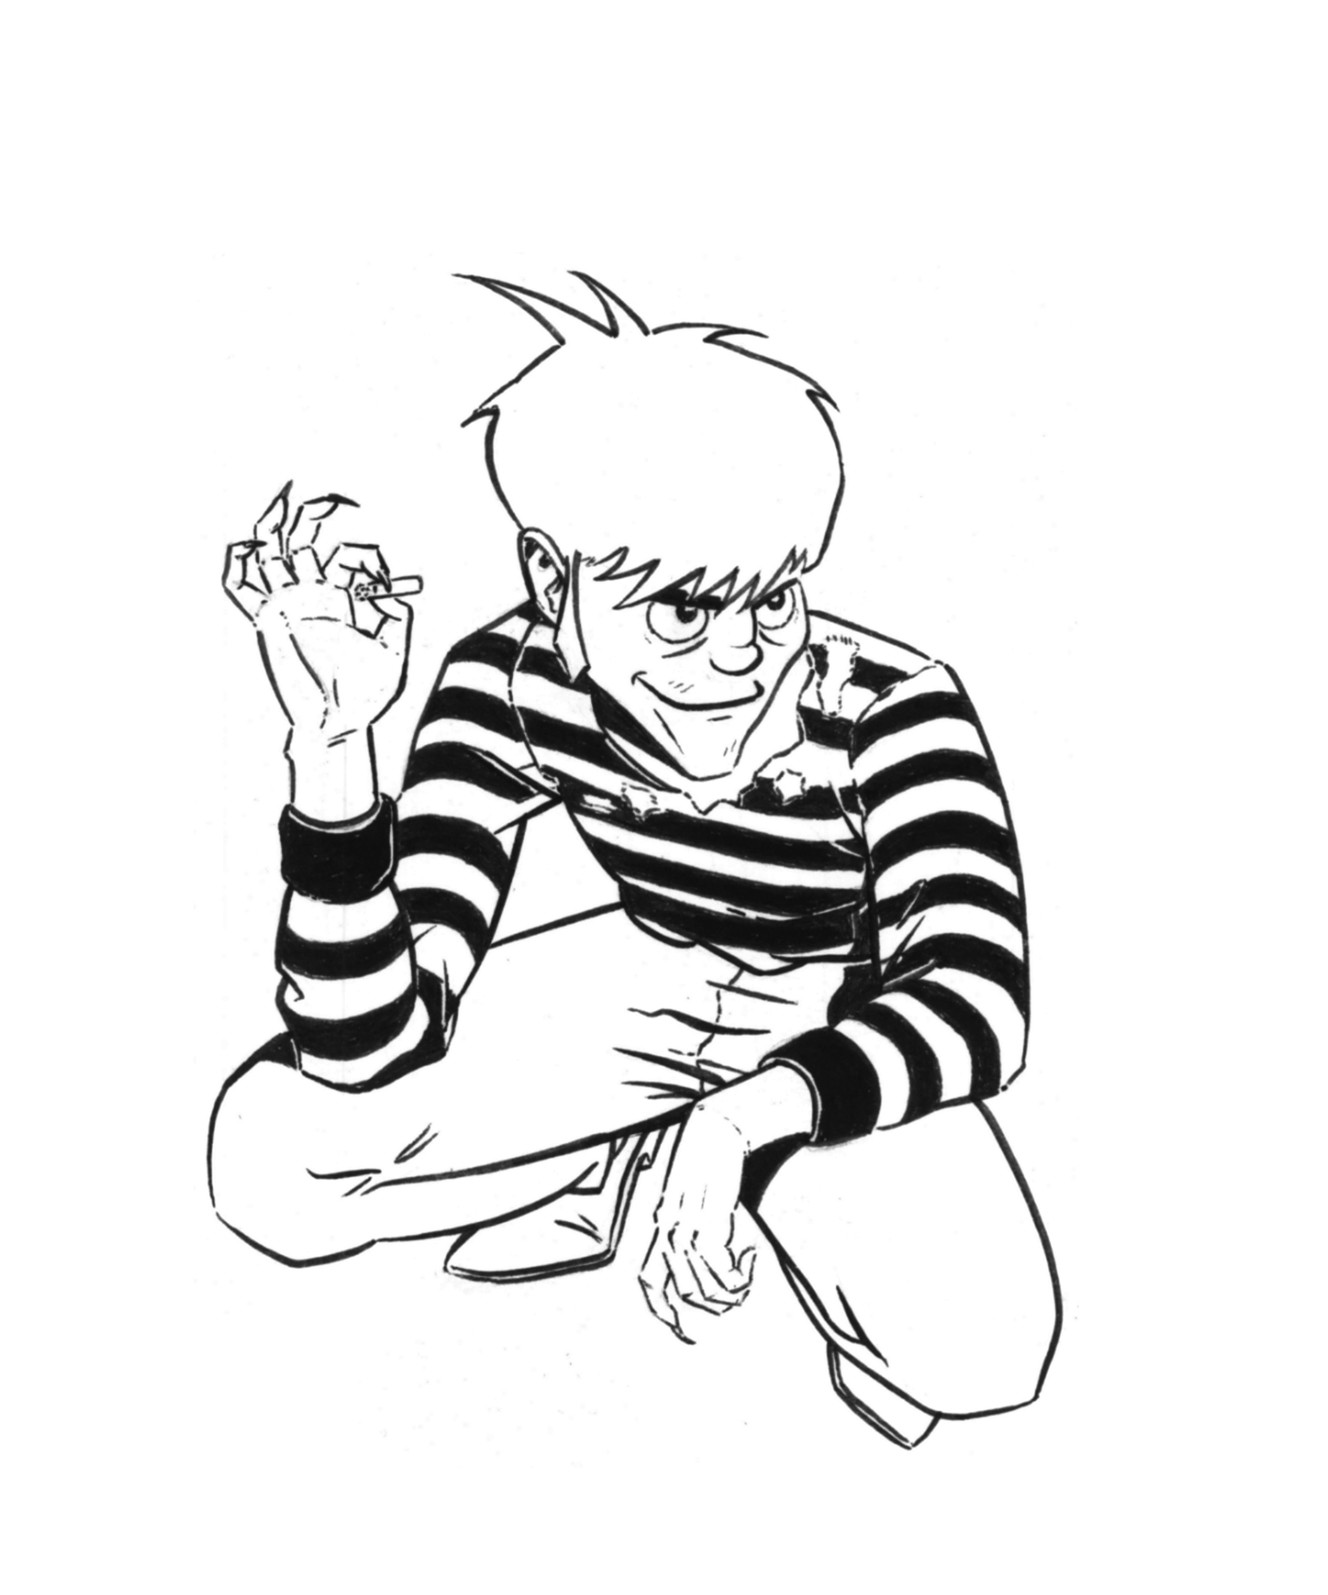 The original black and white inked illustration.